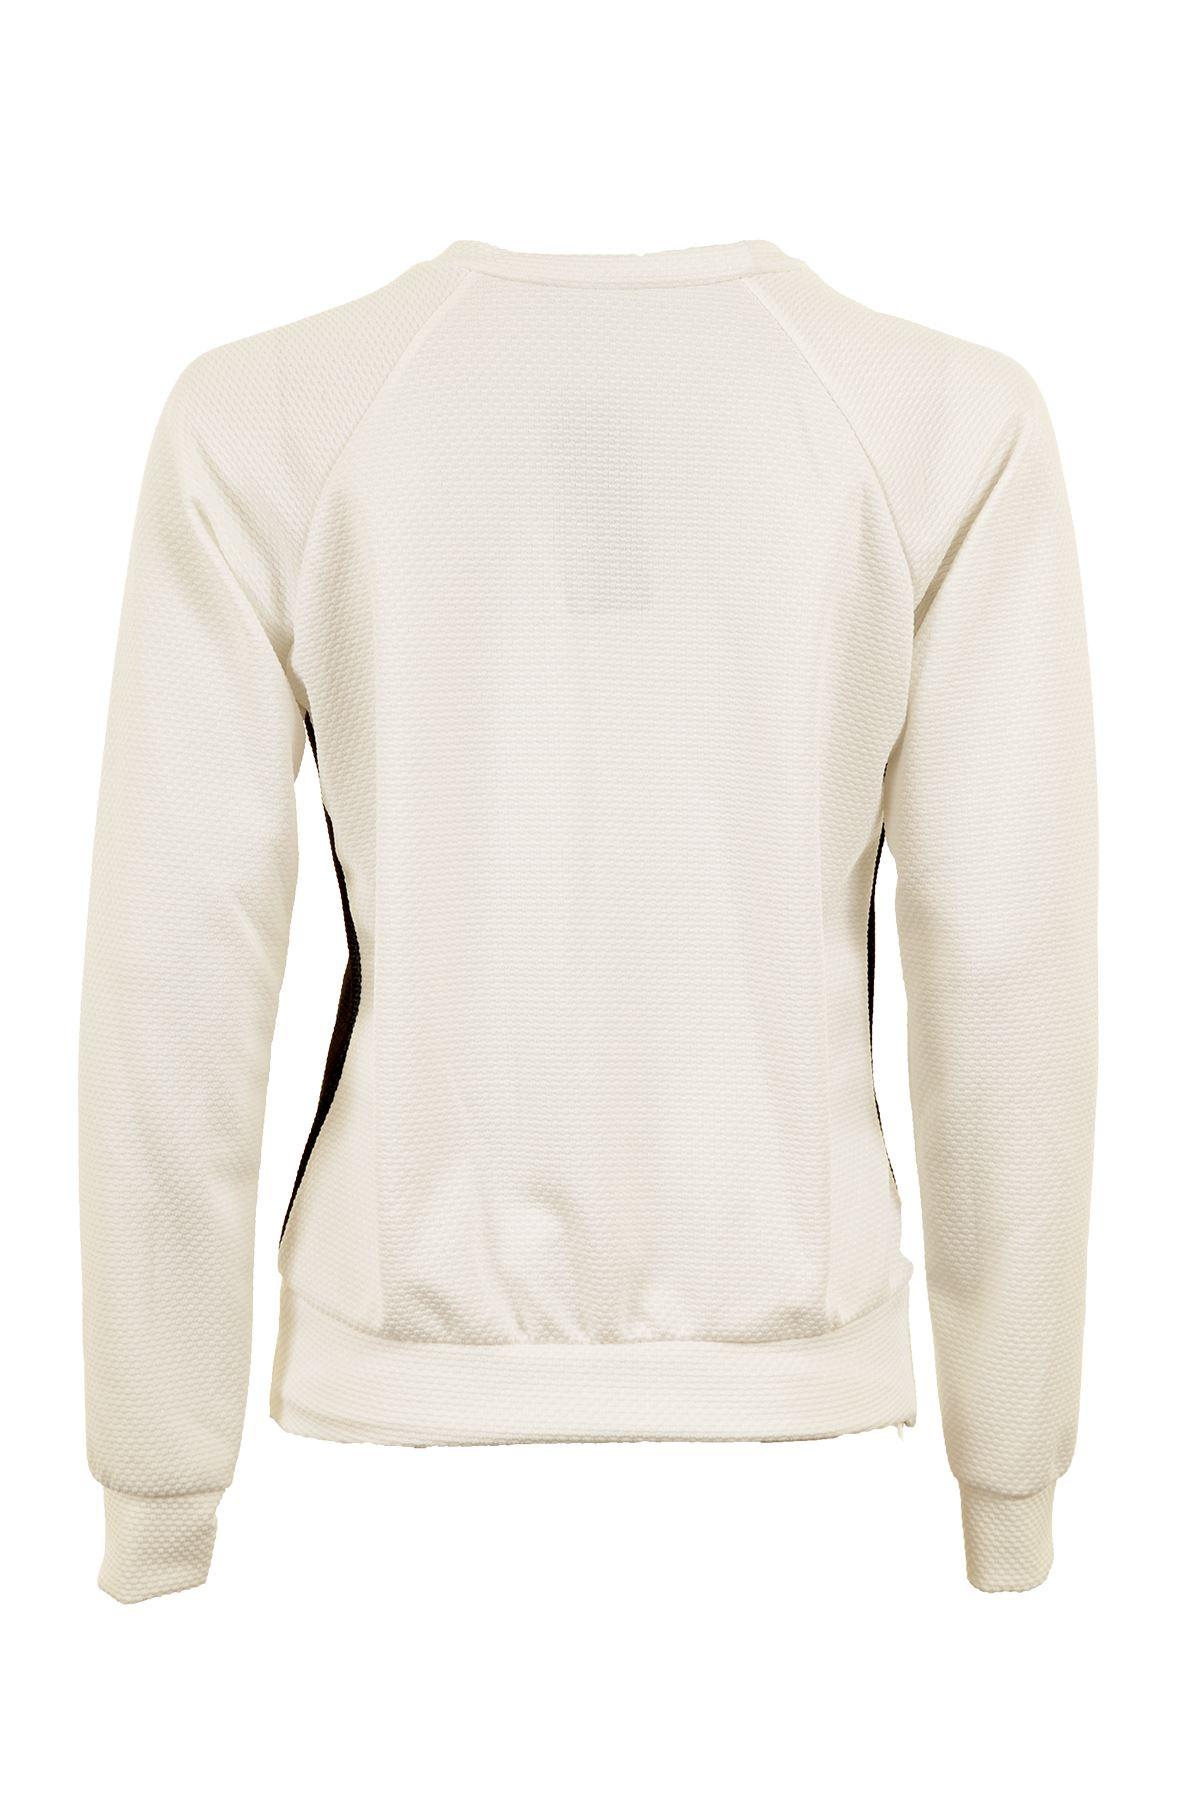 Women/'s White Black Scoop Neck Long Sleeve Panther Print Ladies Top Jumper